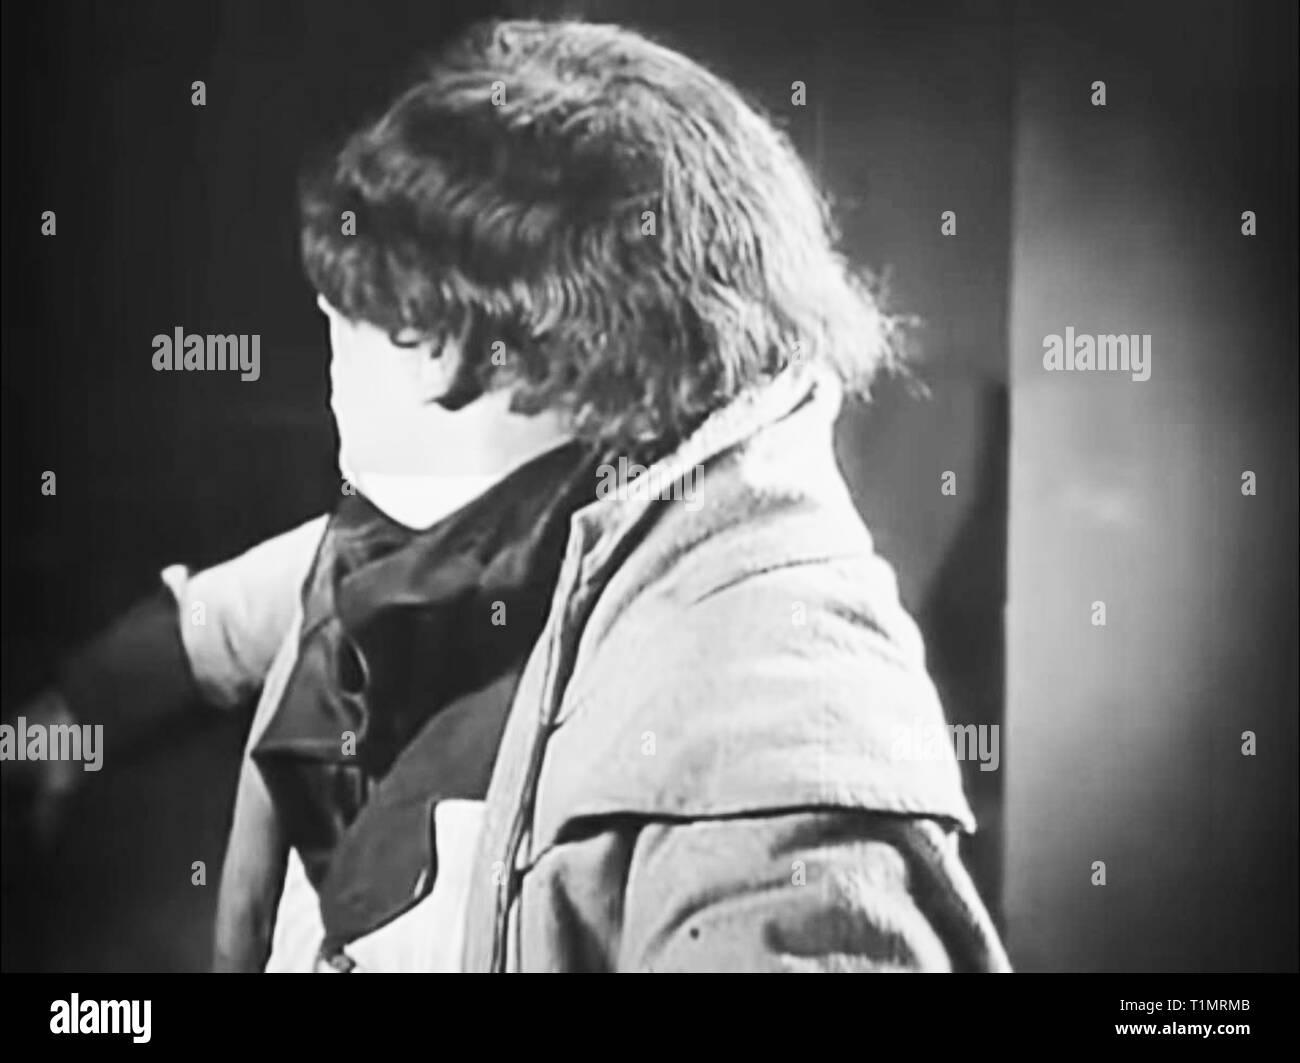 Vintage screen from Nosferatu 1922 movie starring Max Schreck and